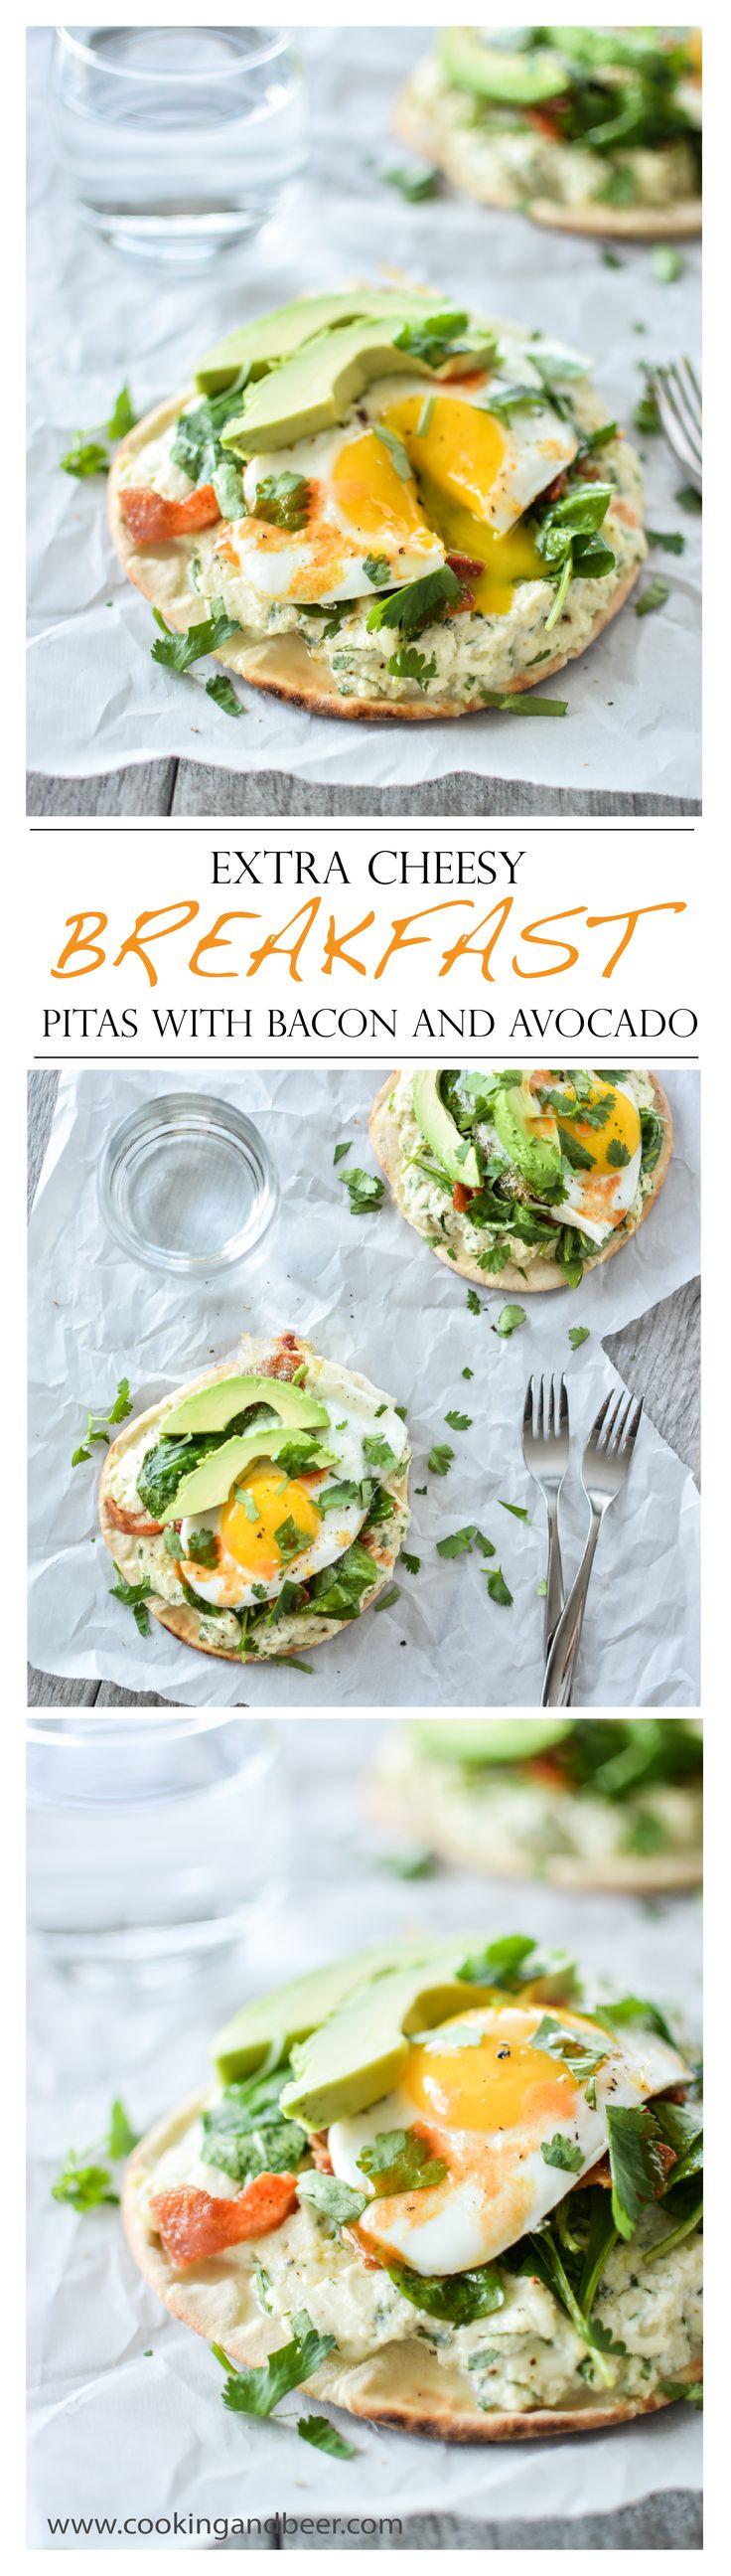 Extra Cheesy Breakfast Pitas with Bacon and Avocado    www.cookingandbeer.com   @jalanesulia